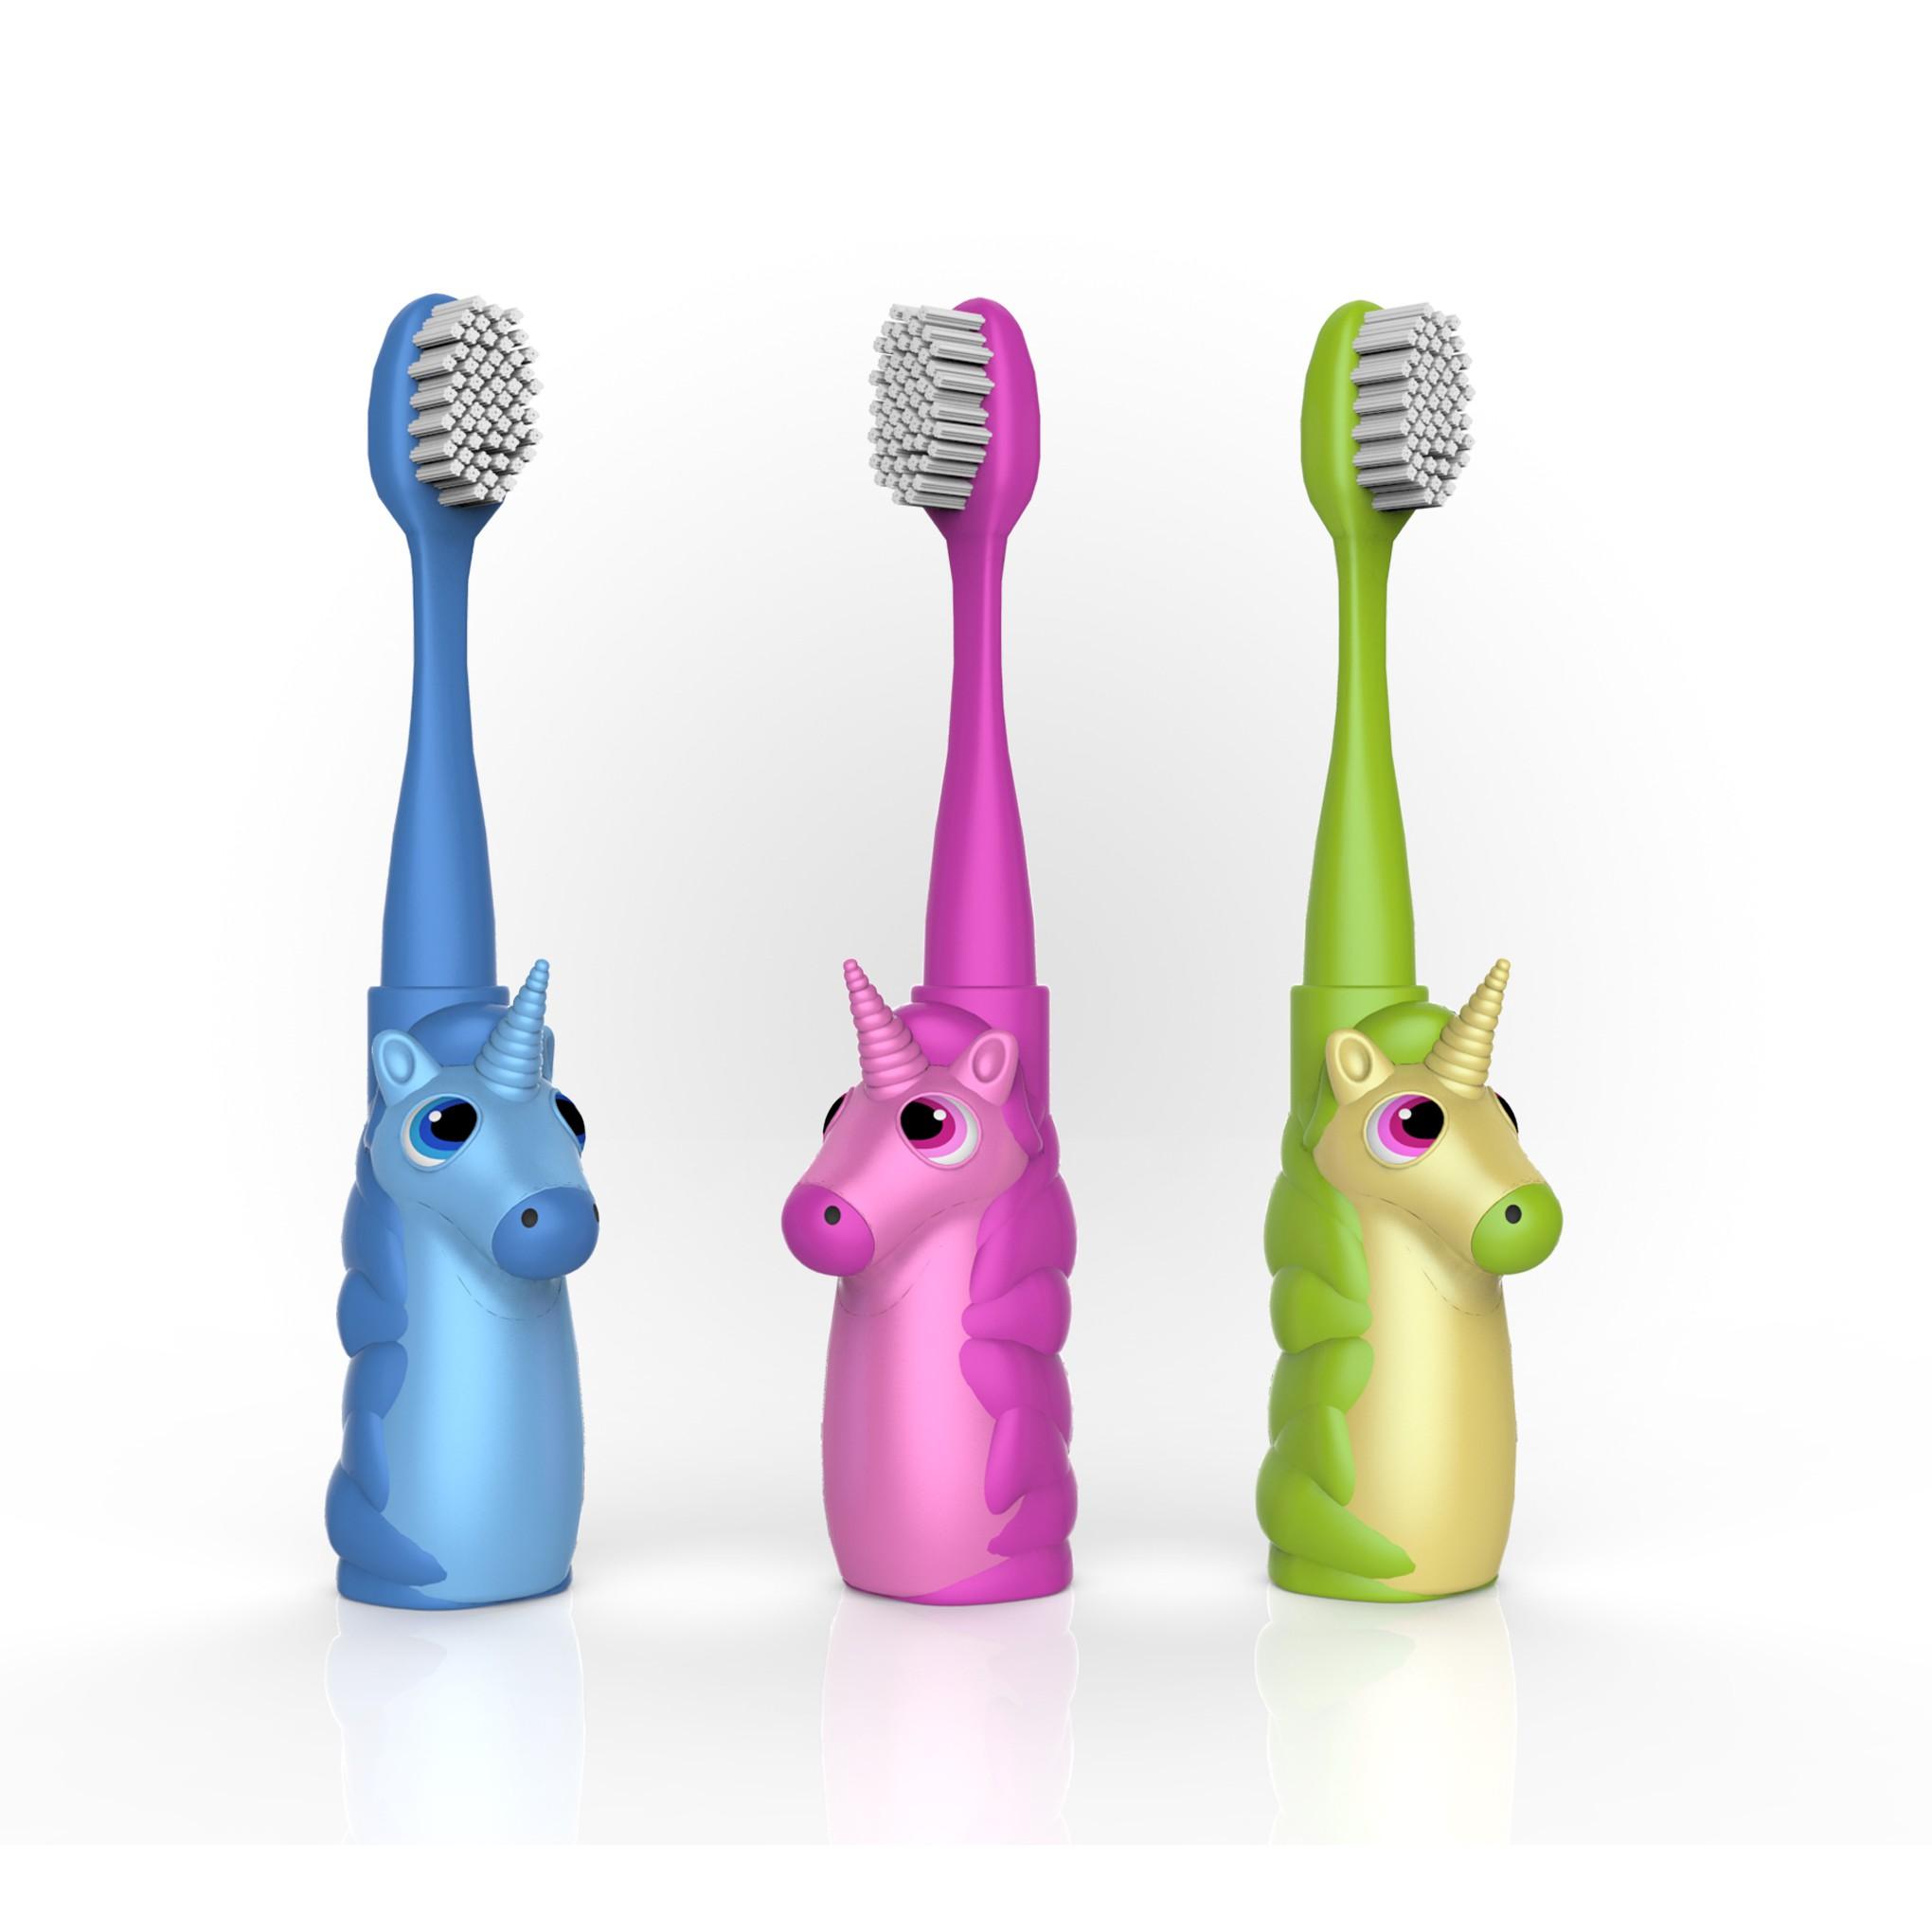 Toothbrush handle